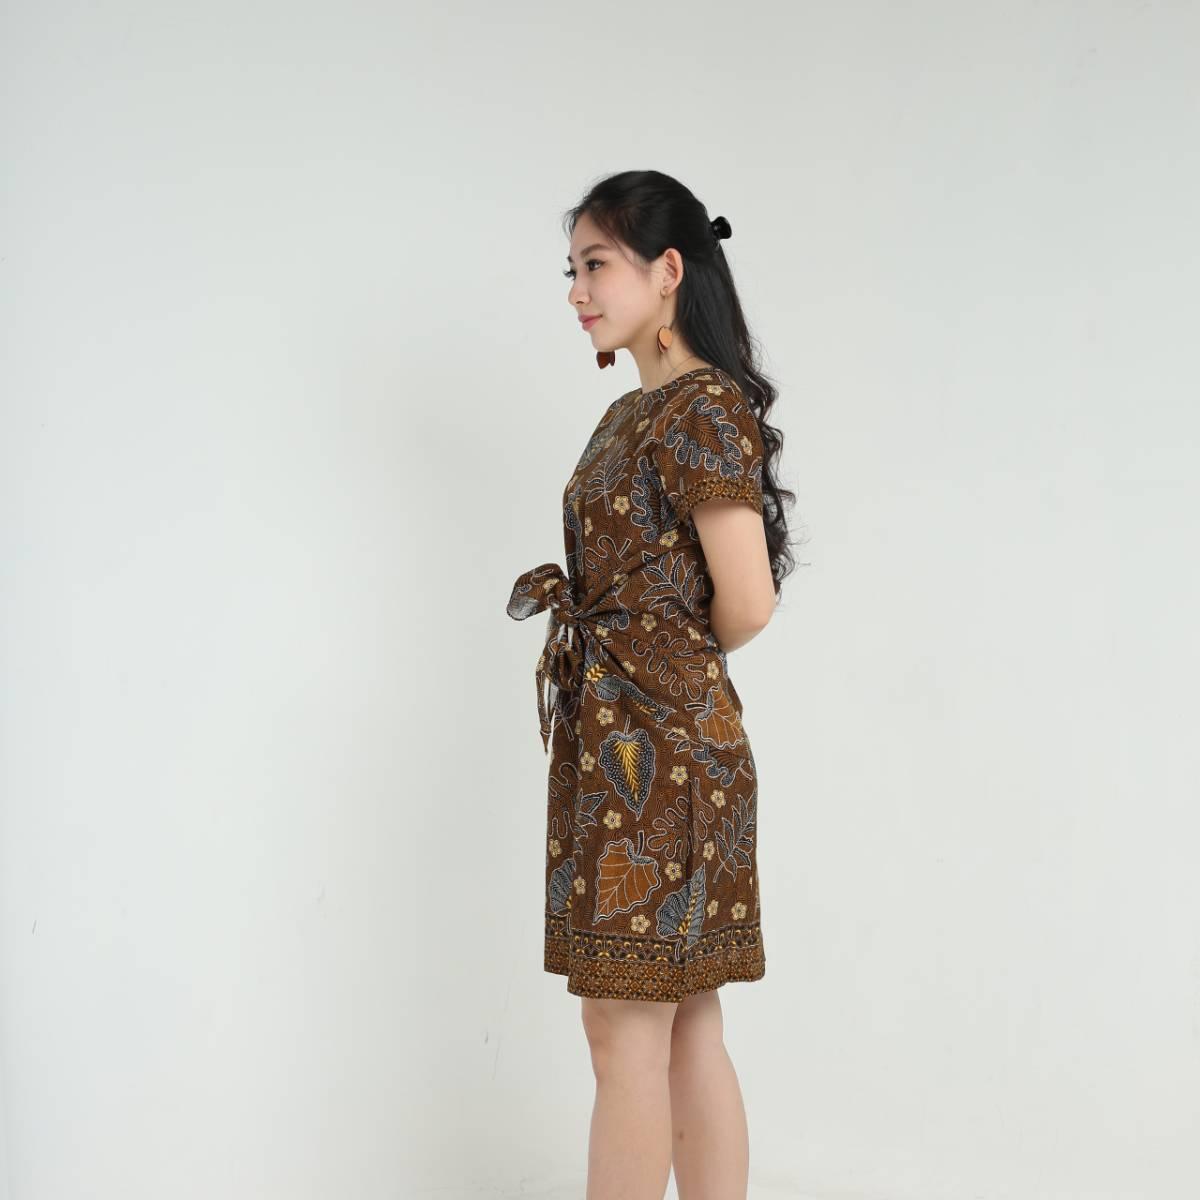 Dress Wanita Batik - Priska Dress1